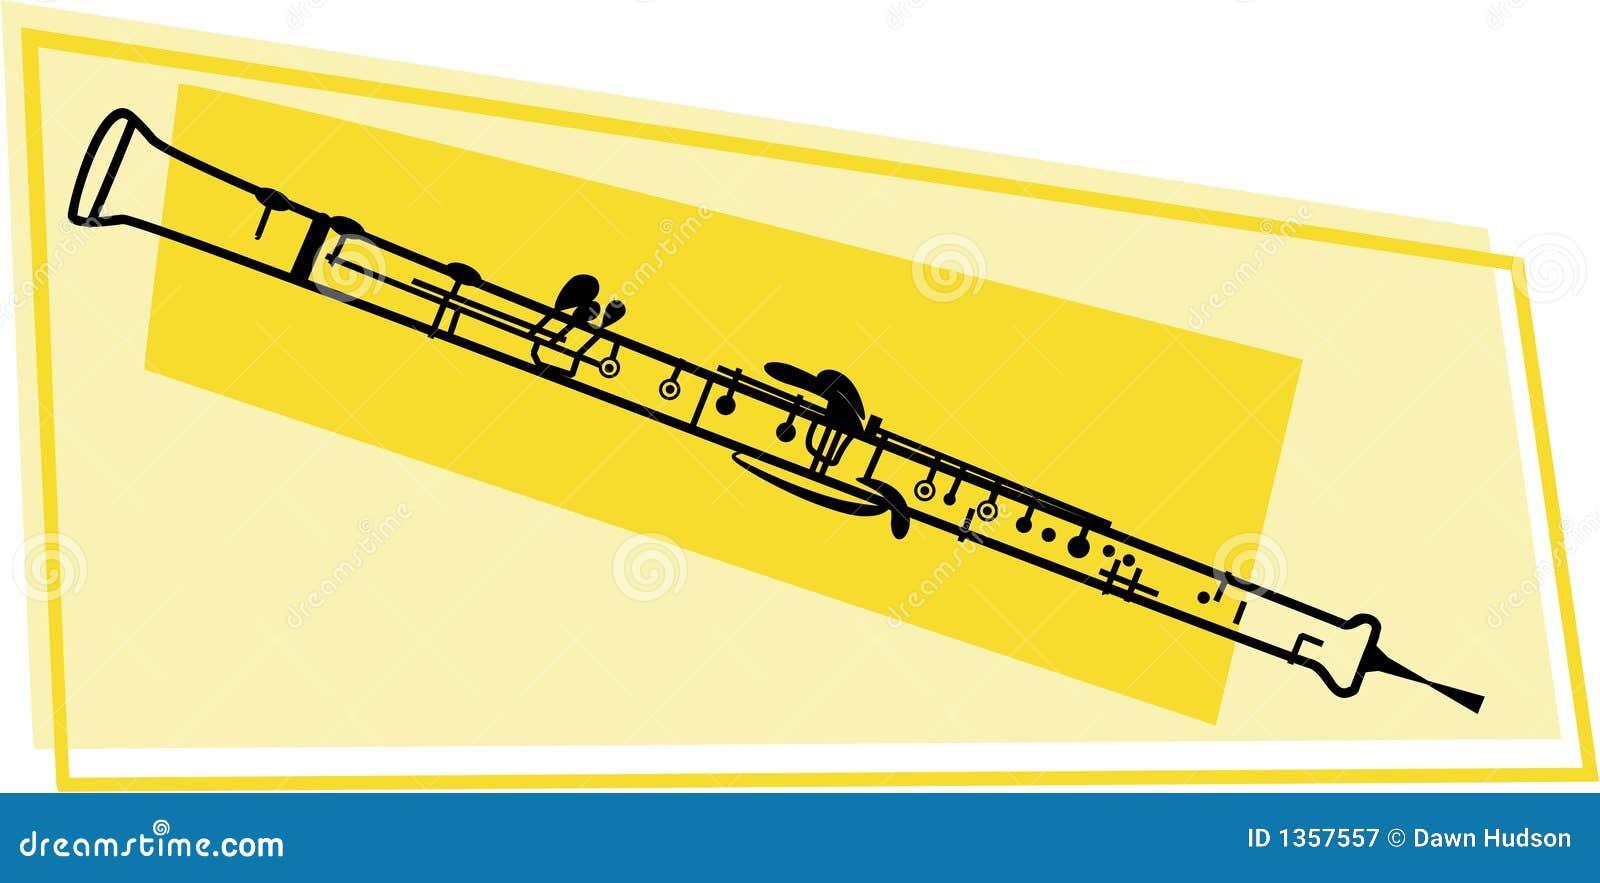 oboe ikone vektor abbildung illustration von abbildung